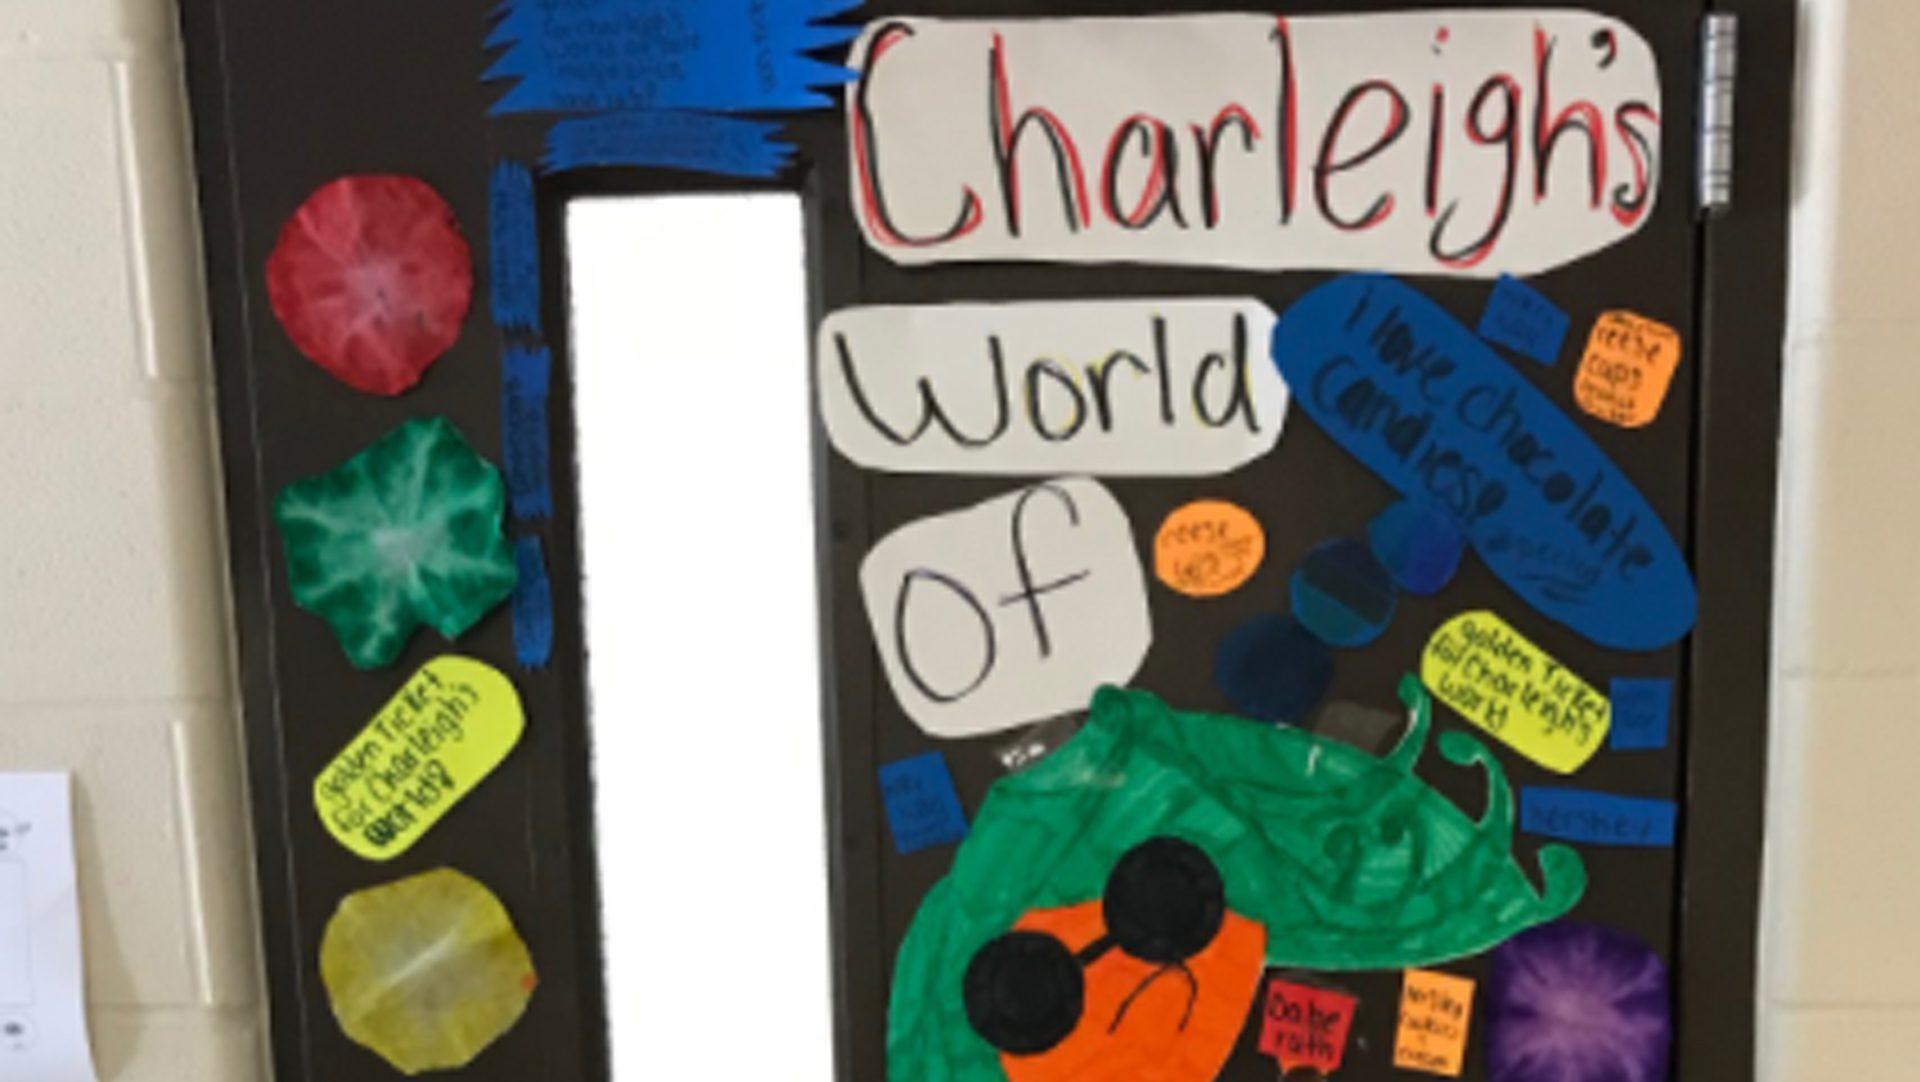 Charlies World of Imagination Door Decoration